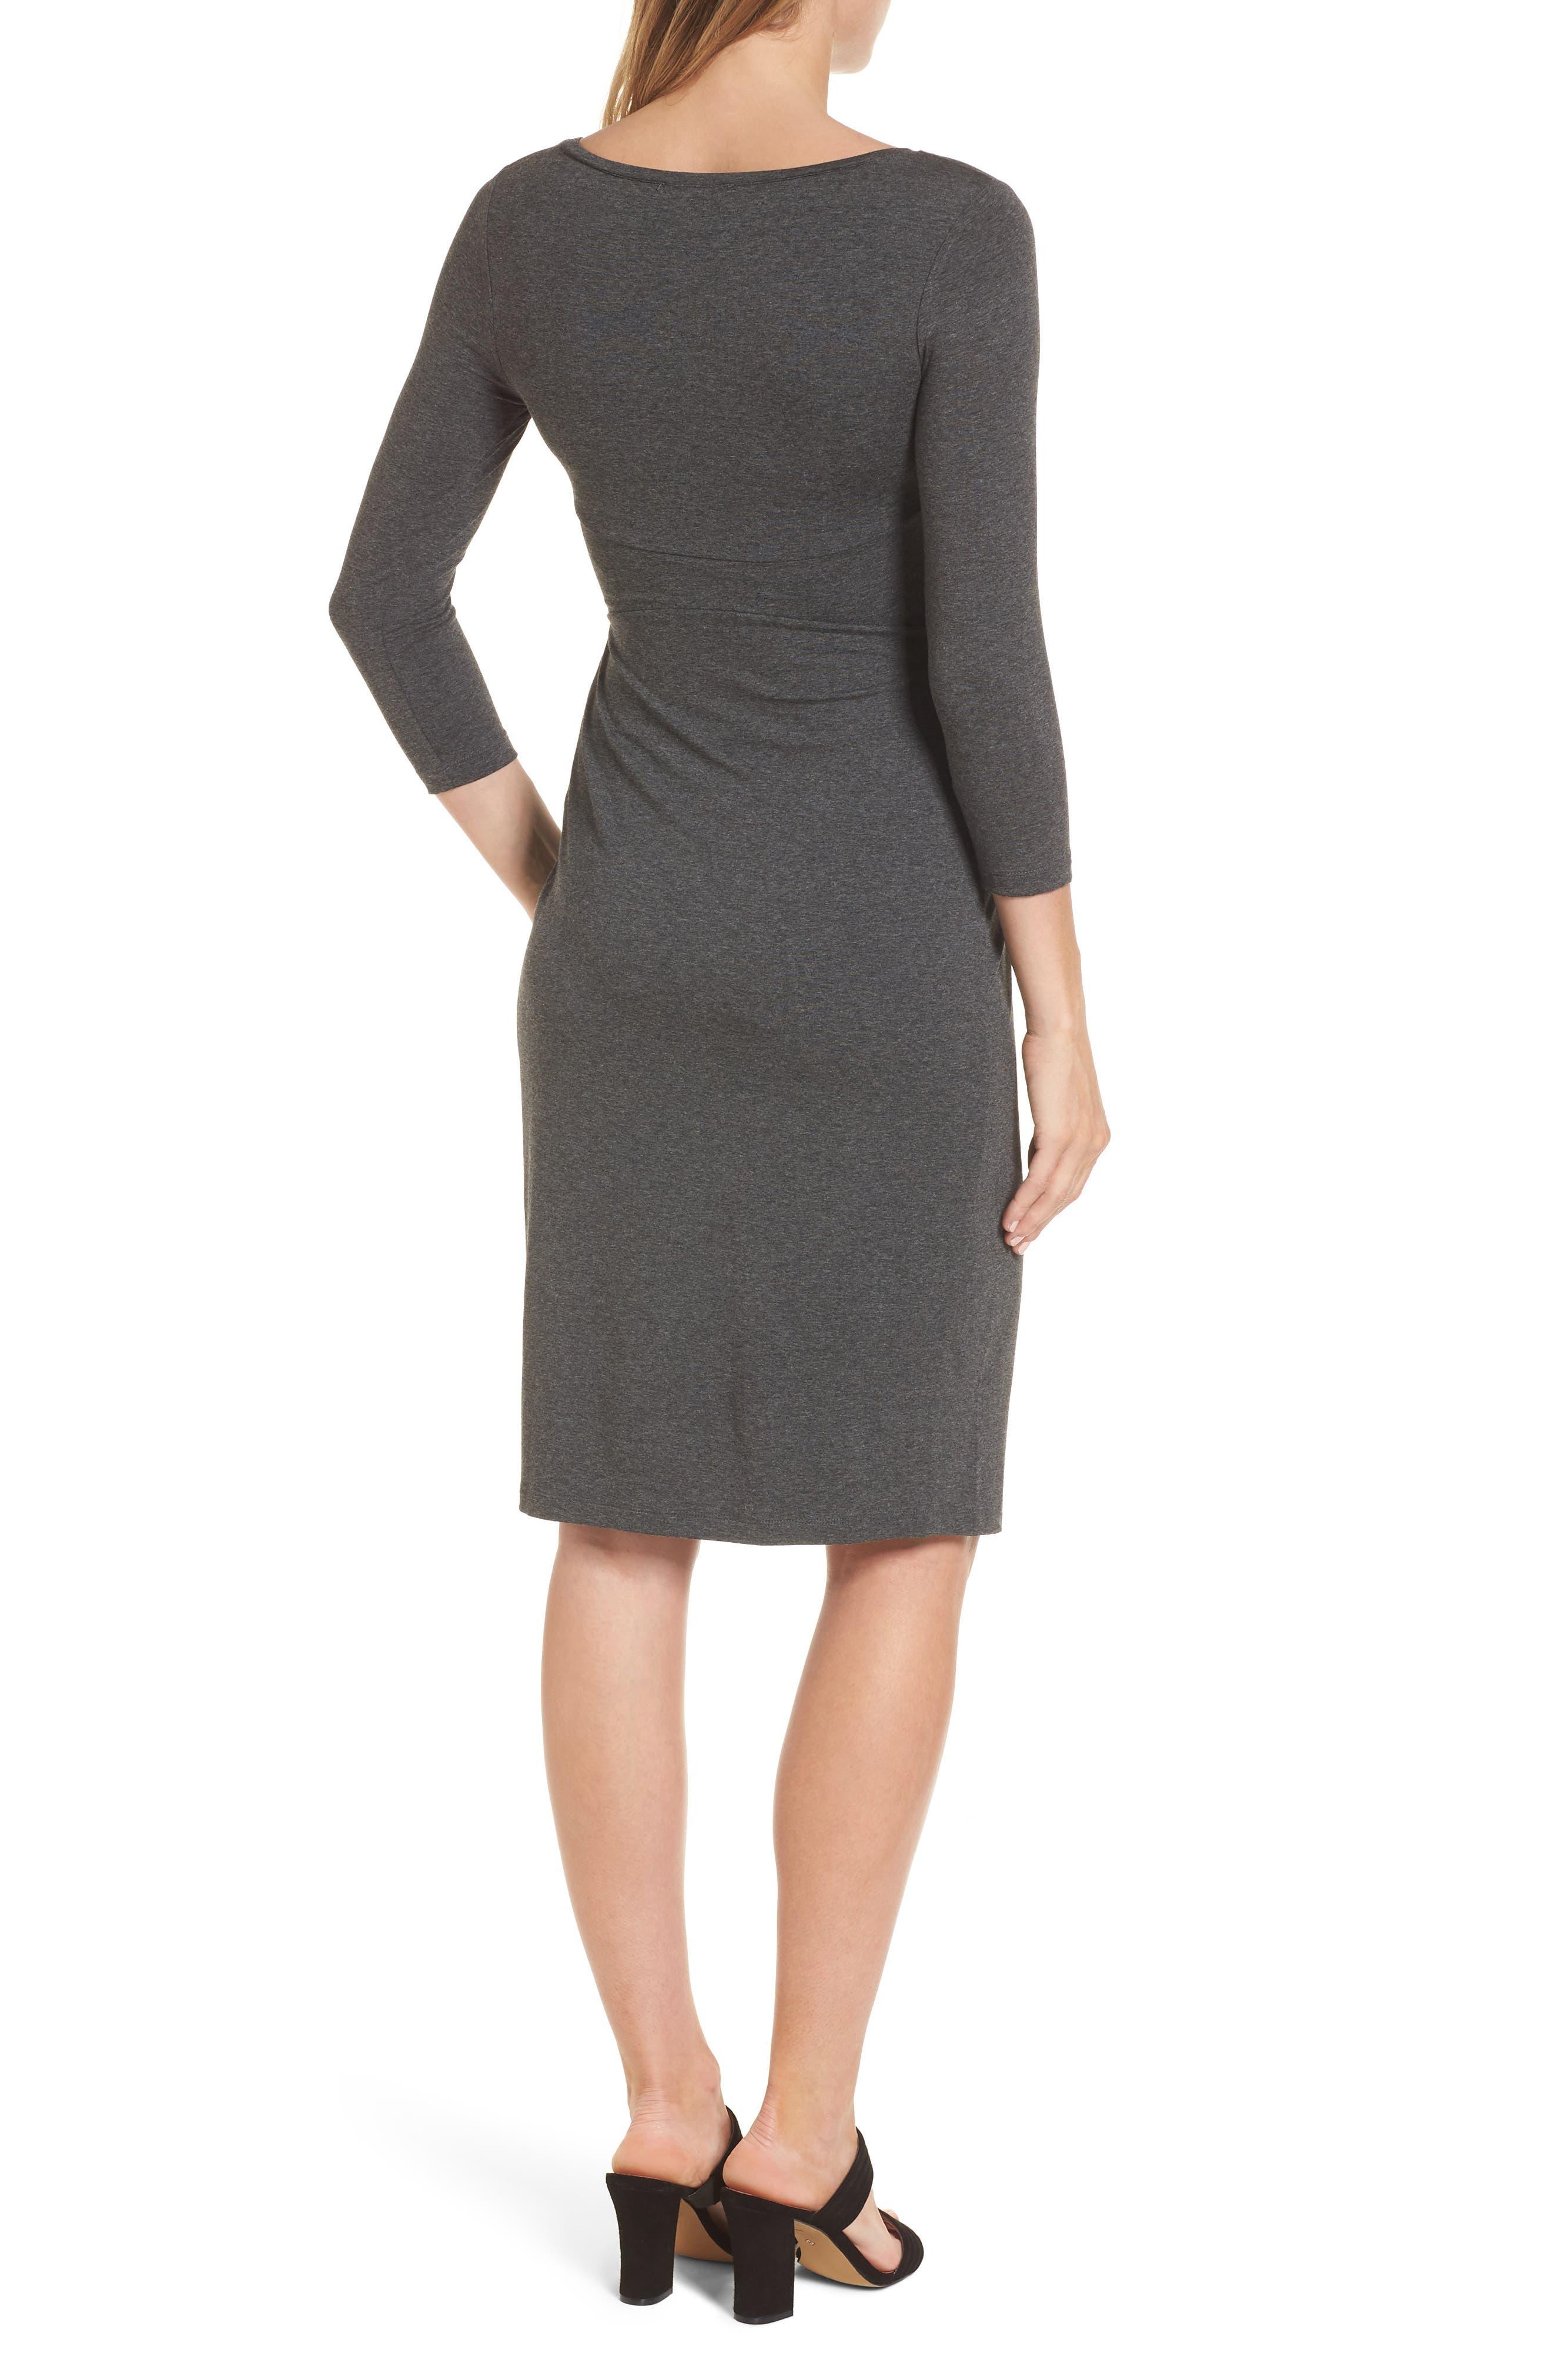 Ivybridge Jersey Maternity Dress,                             Alternate thumbnail 2, color,                             Dark Grey Marl